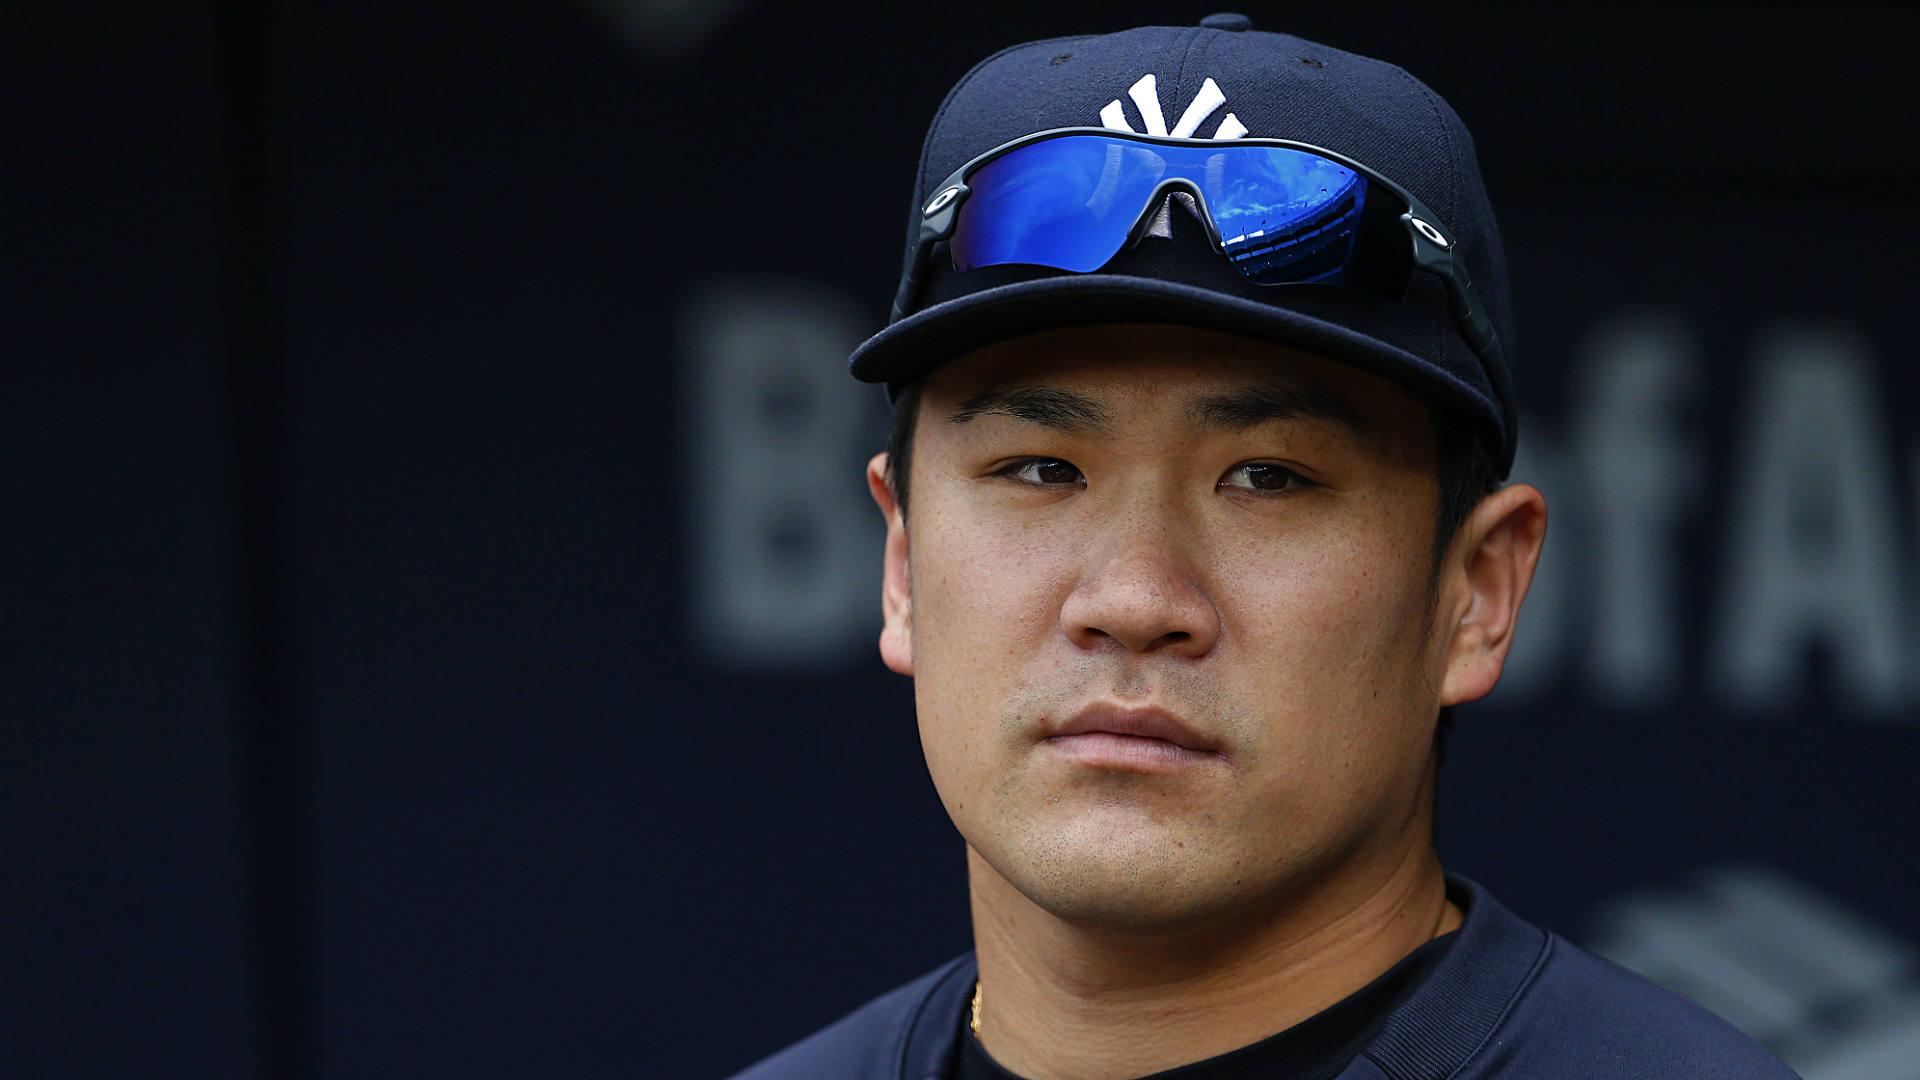 Fantasy baseball rankings: Sunday's starting pitchers